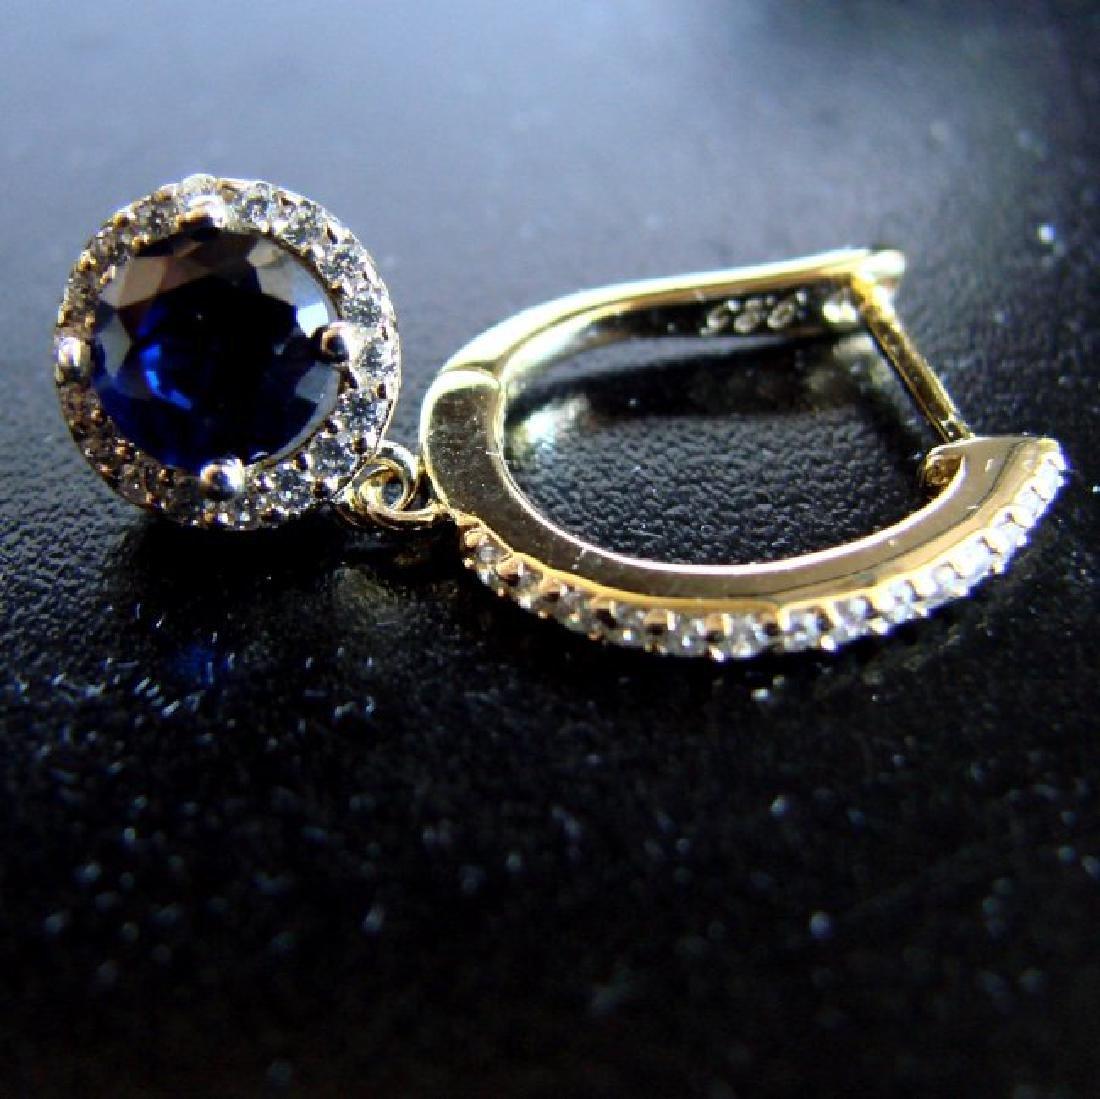 Creation Diamond-Sapphire Earring 2.81Ct18k Y/g Overlay - 2